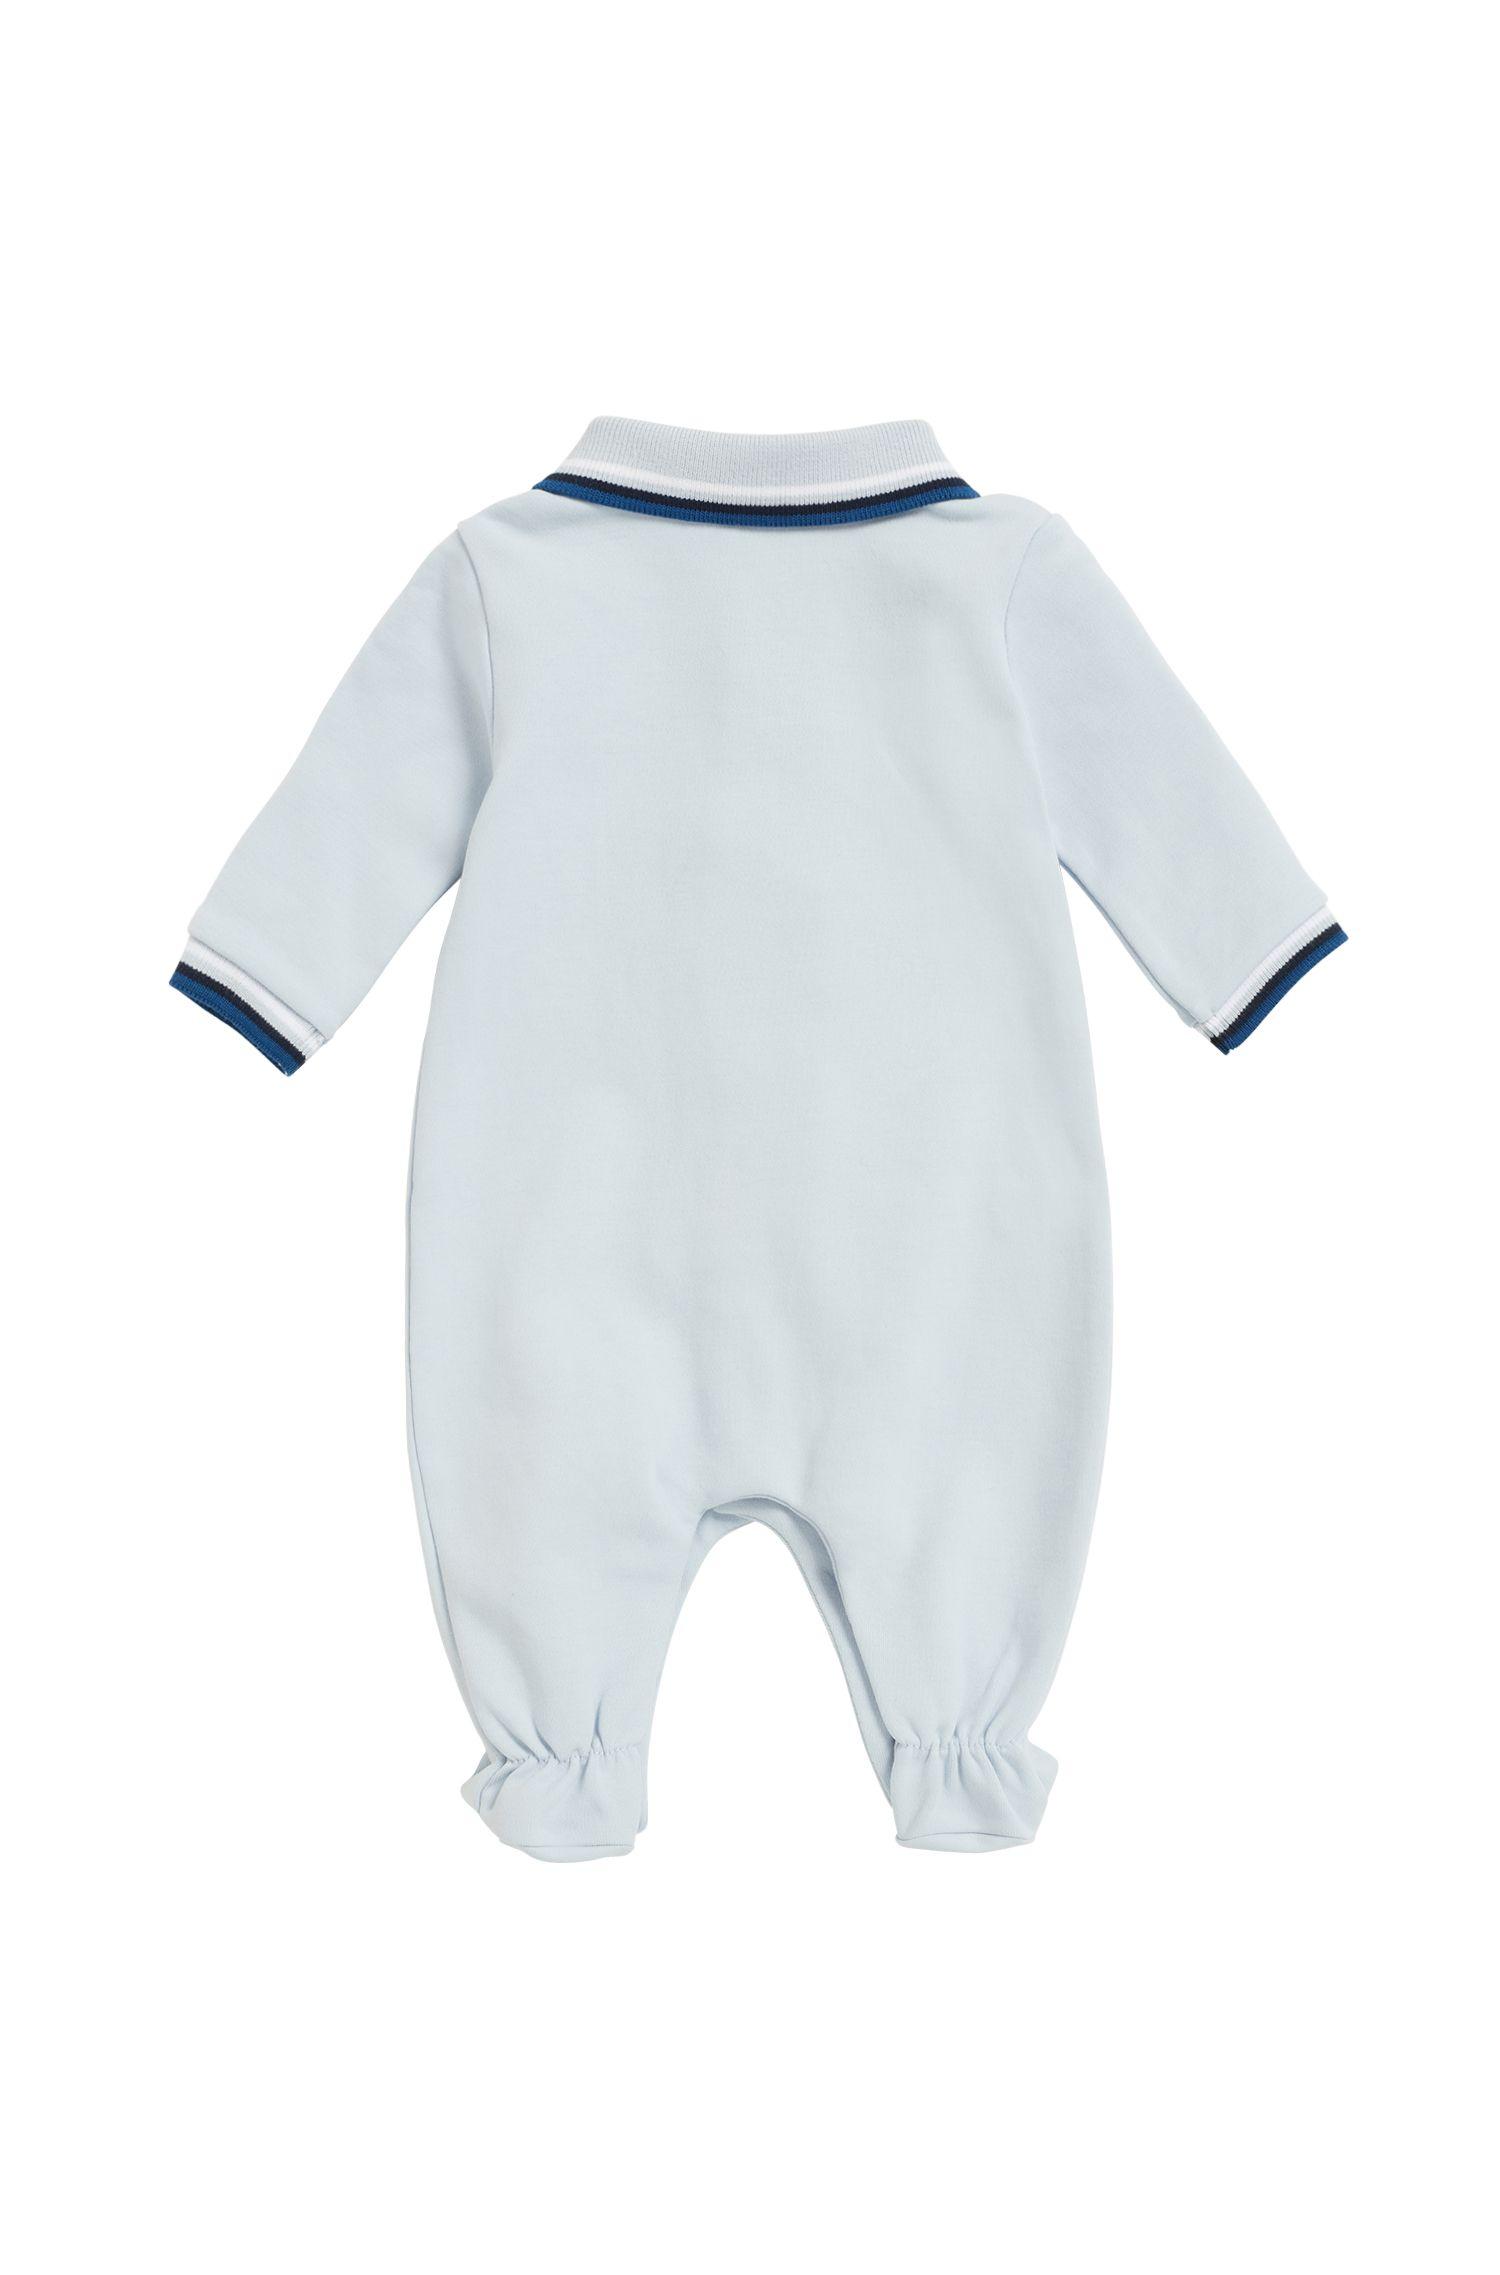 Babyslaappakje van interlocked katoen, Lichtblauw